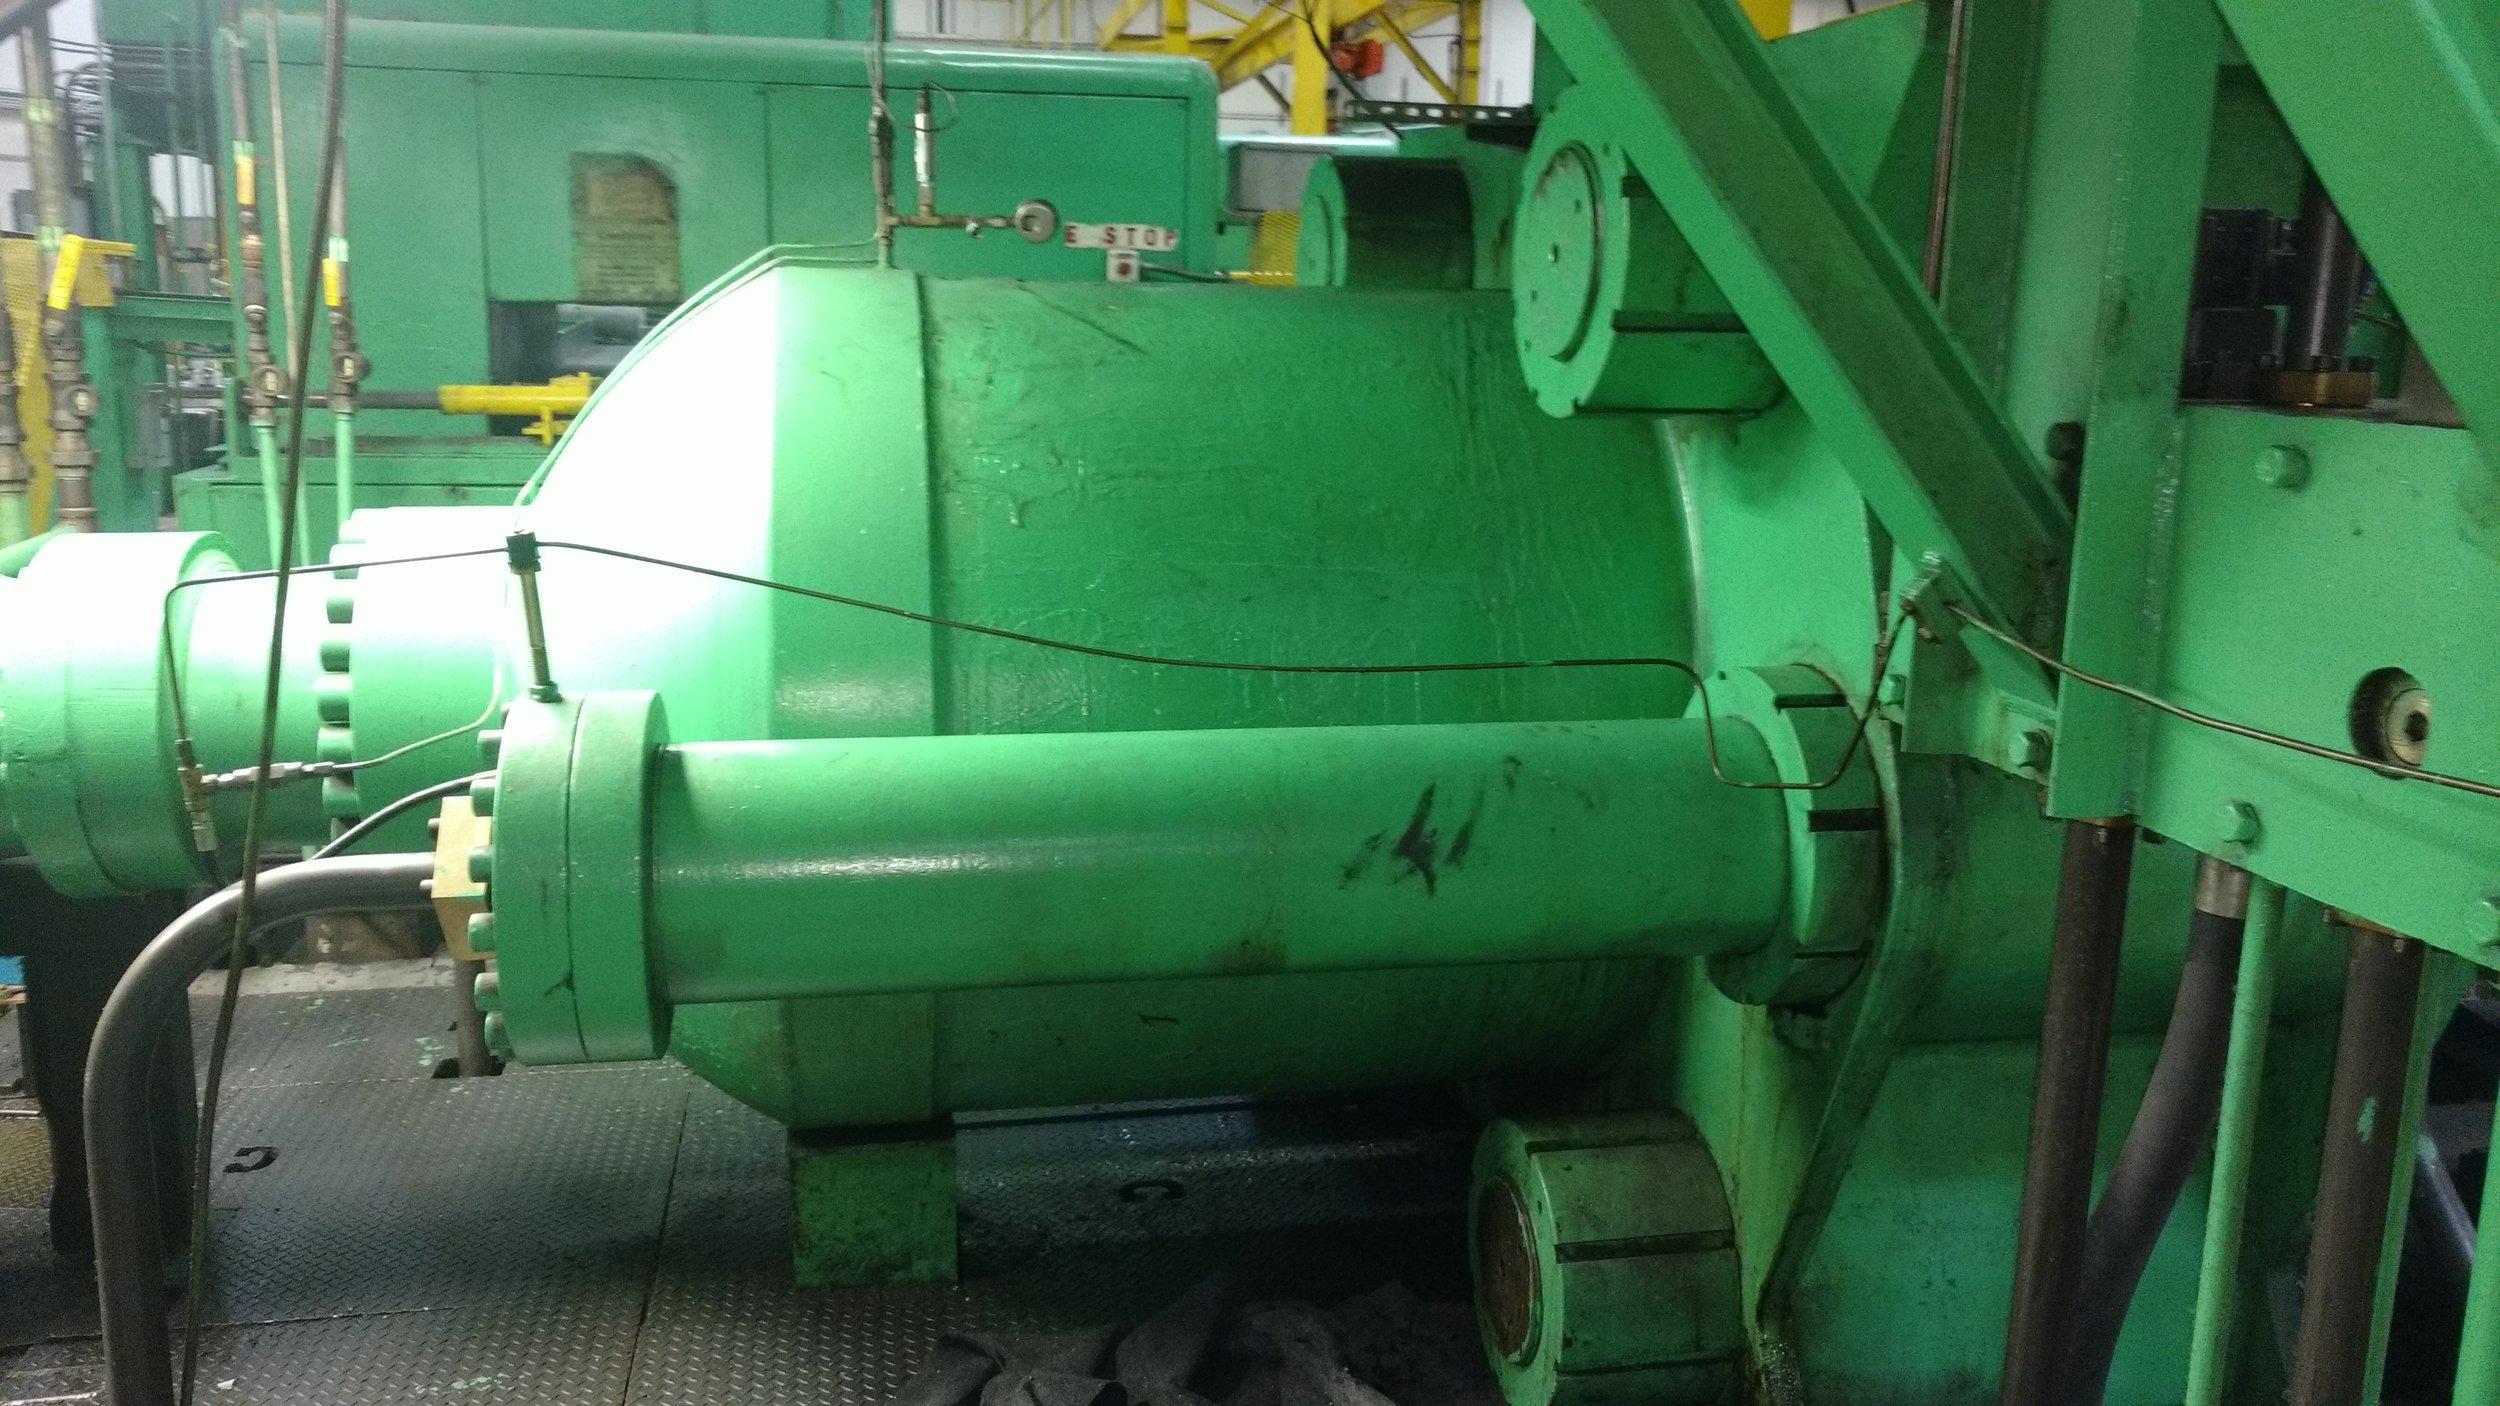 Carlesa NDE Services Nondestructive Examination Hydraulic Press Inspection Contact Us.jpg